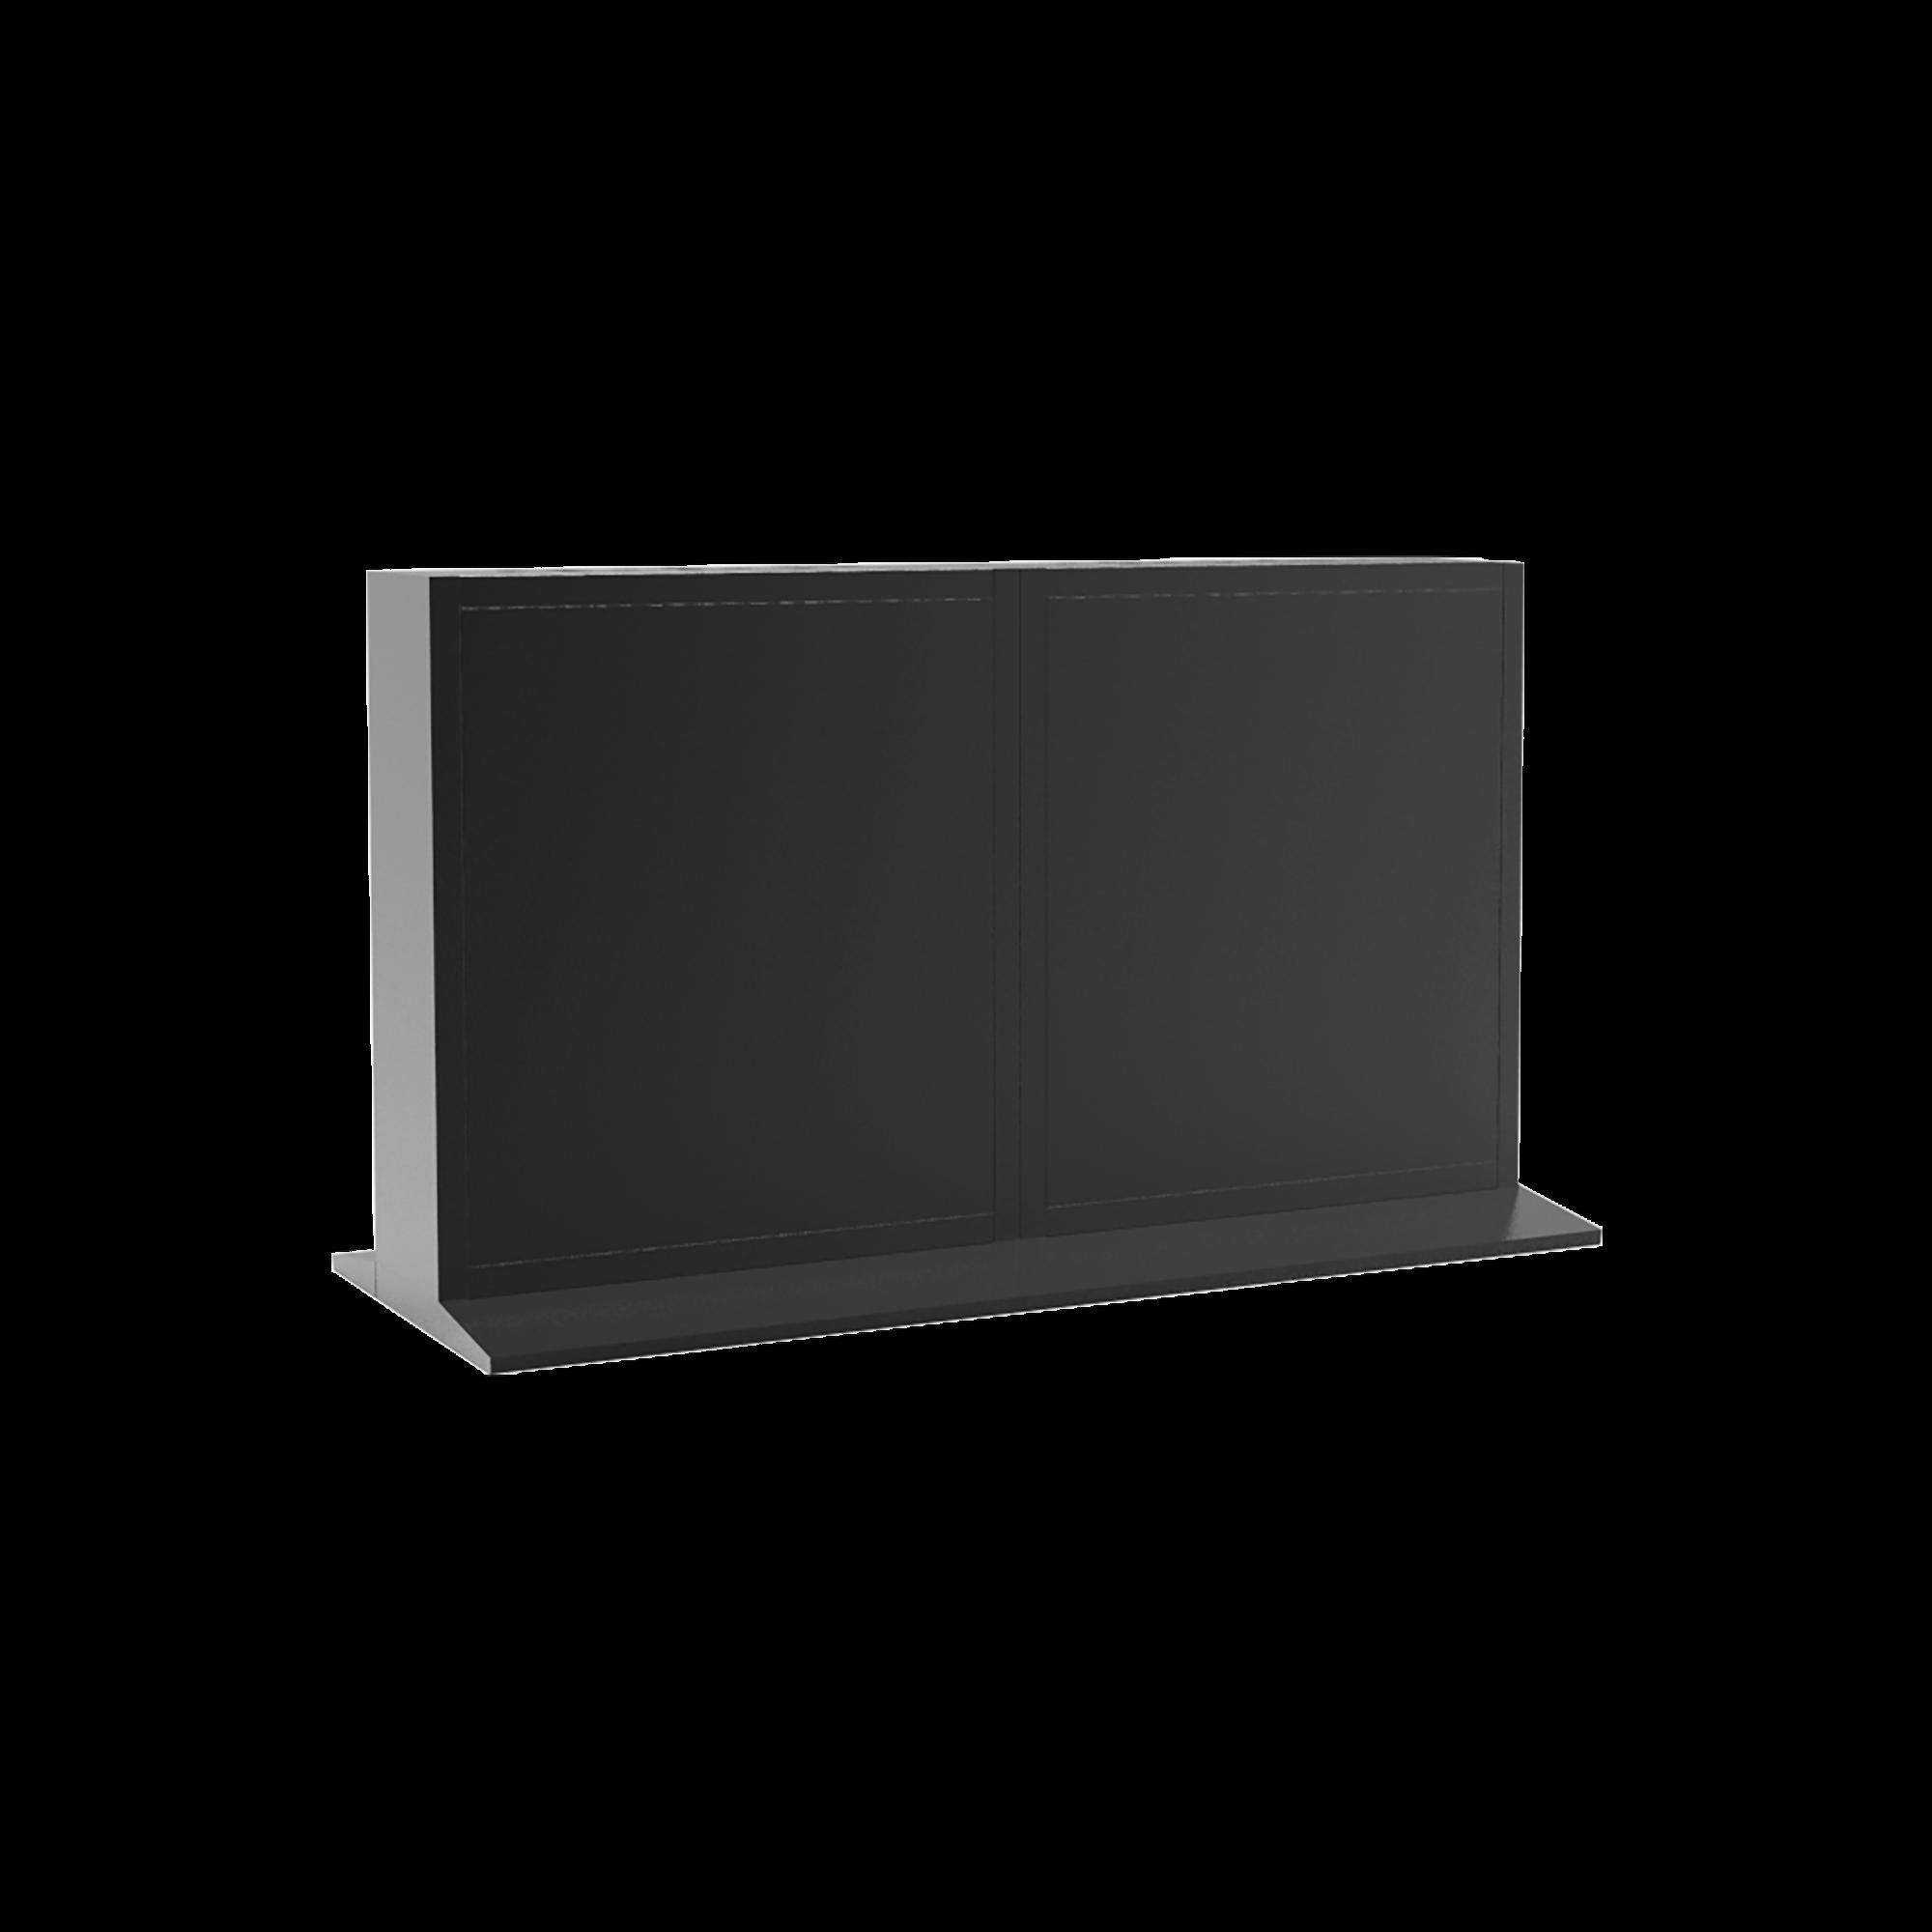 Gabinete Pedestal Modular Para Piso / Compatible con Monitor de 55 / Especial para Videowall / Compatible con DS-D2055NL-B/G - DS-D2055LU-Y